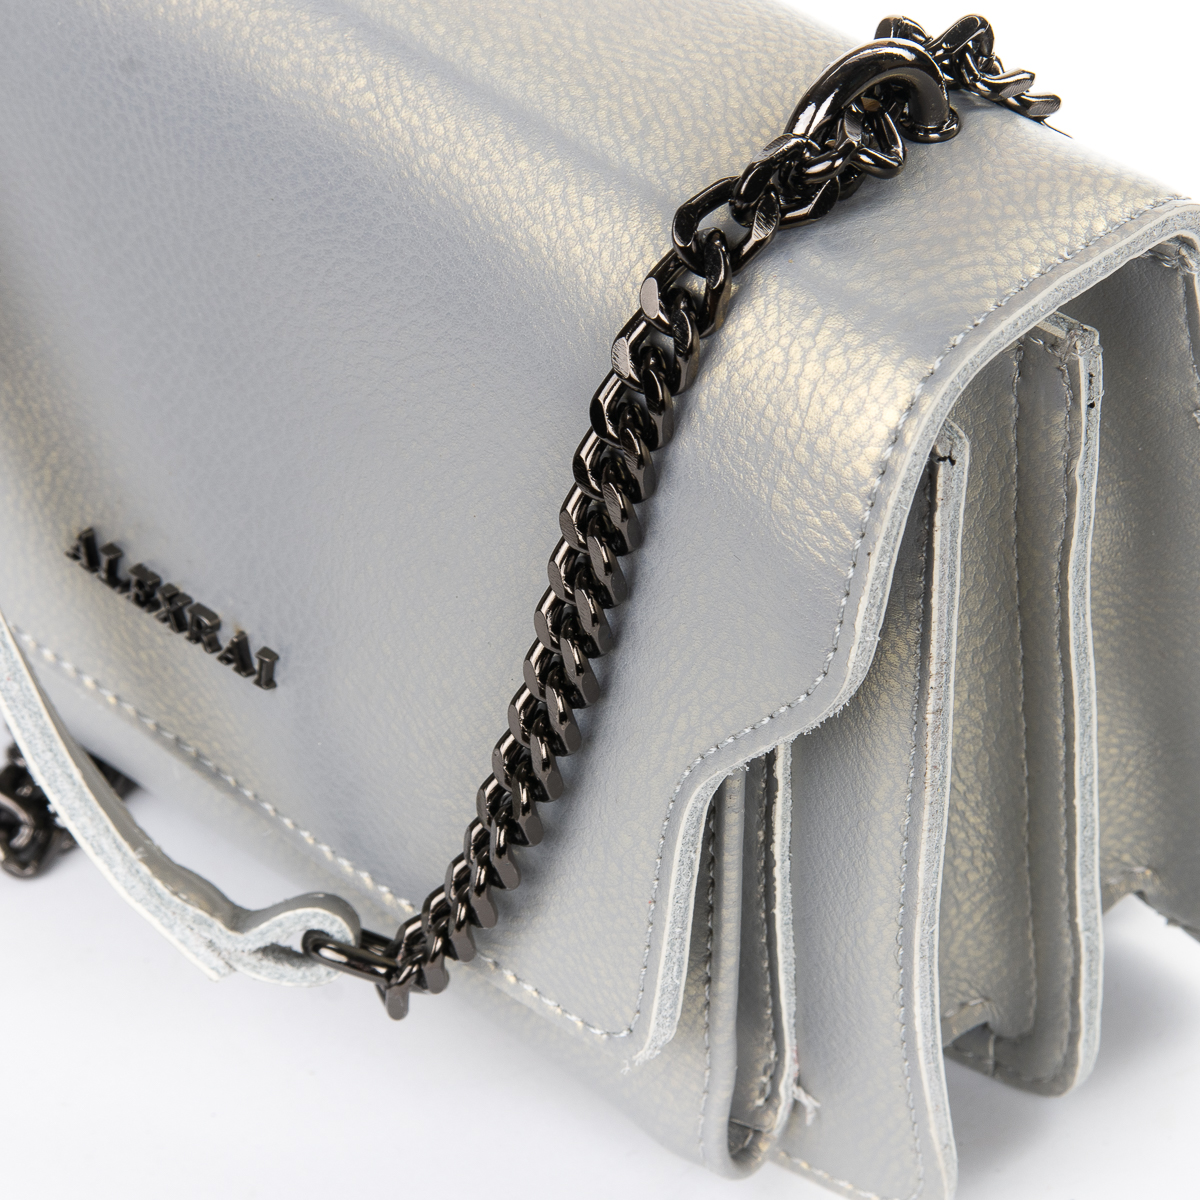 Сумка Женская Клатч кожа ALEX RAI 06-1 8543 pearl-lgrey - фото 3